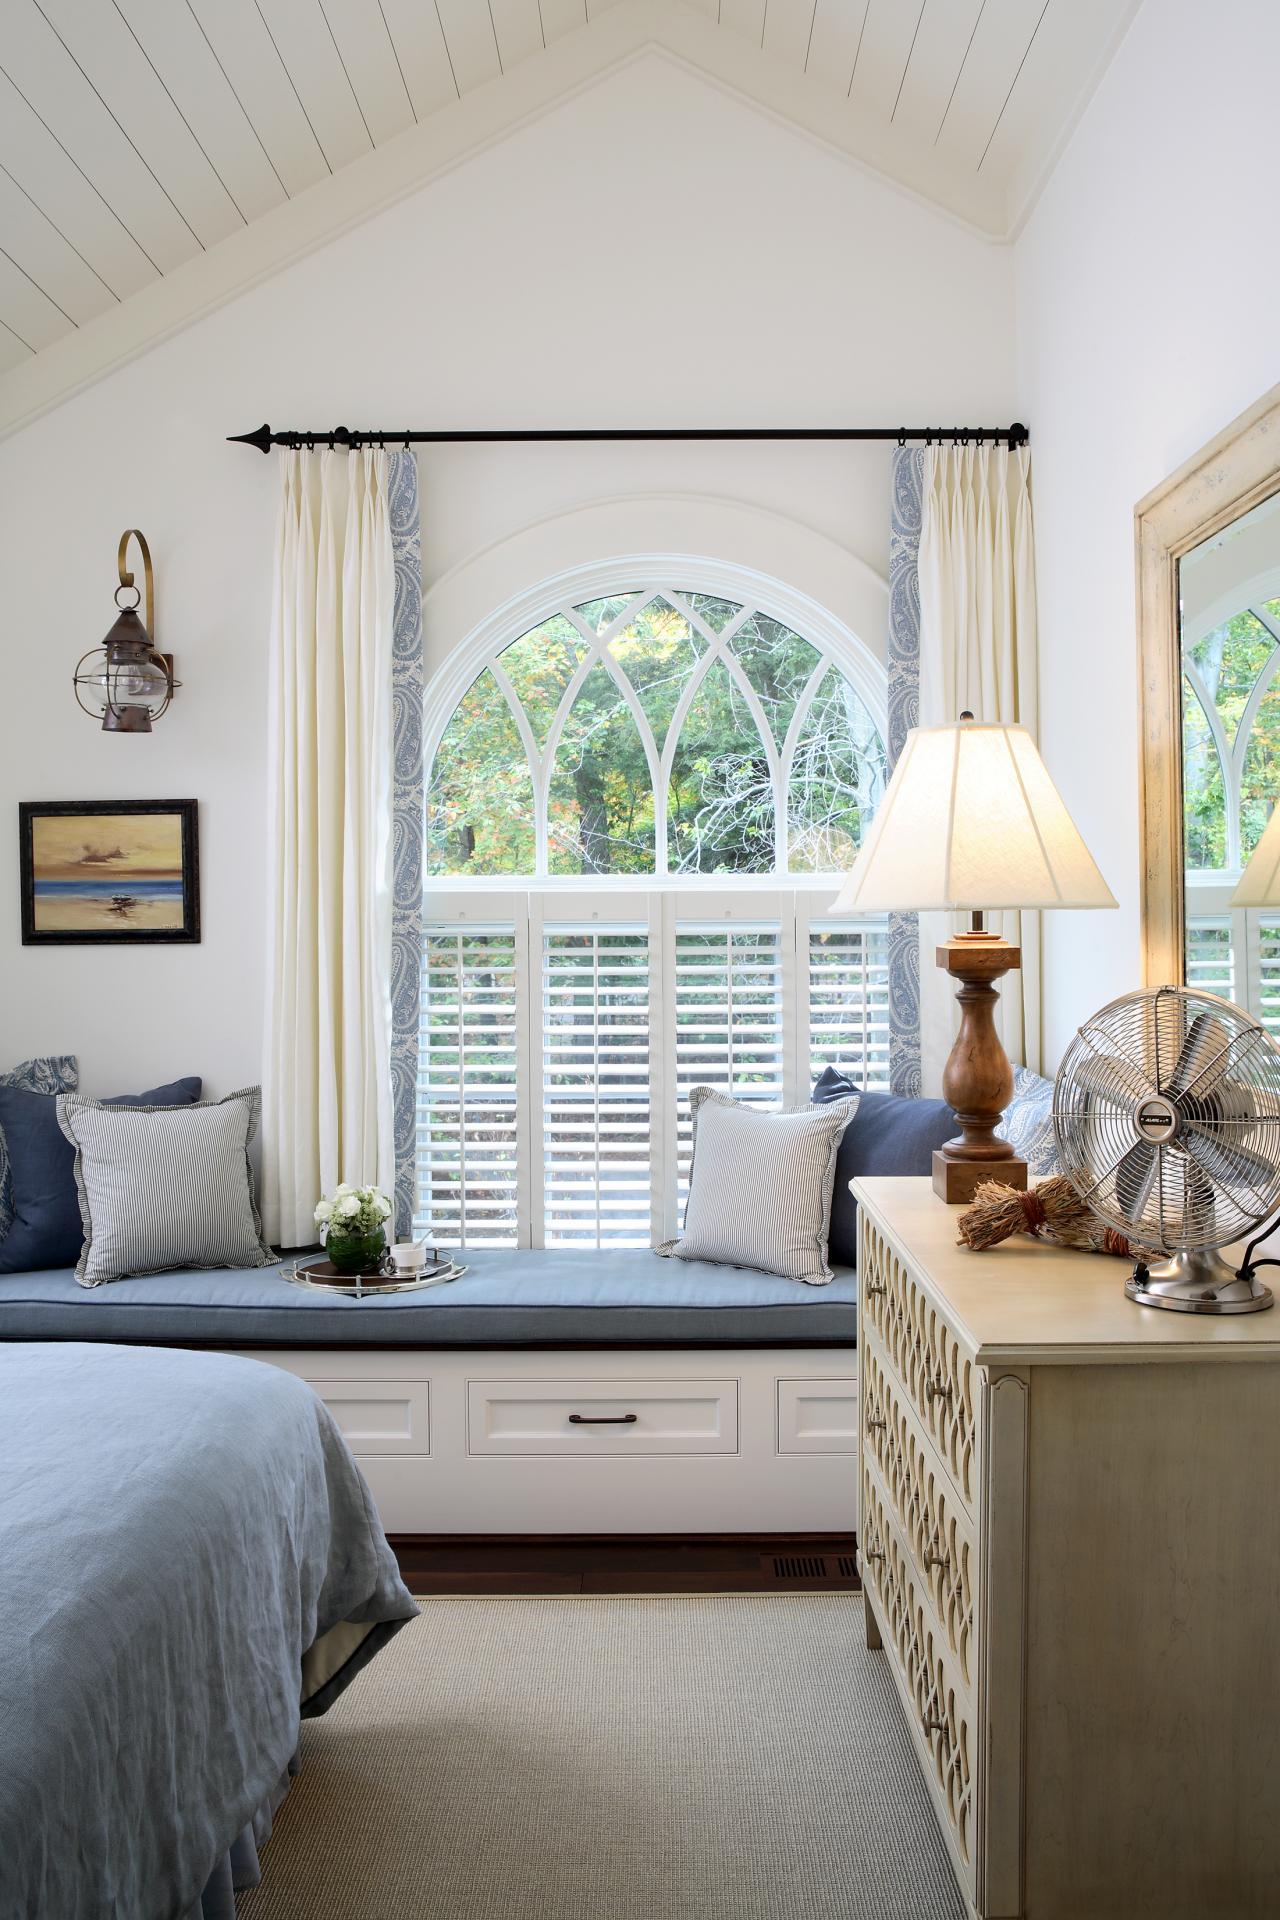 Phenomenal Comfy Window Seat With Built In Storage Hgtv Spiritservingveterans Wood Chair Design Ideas Spiritservingveteransorg